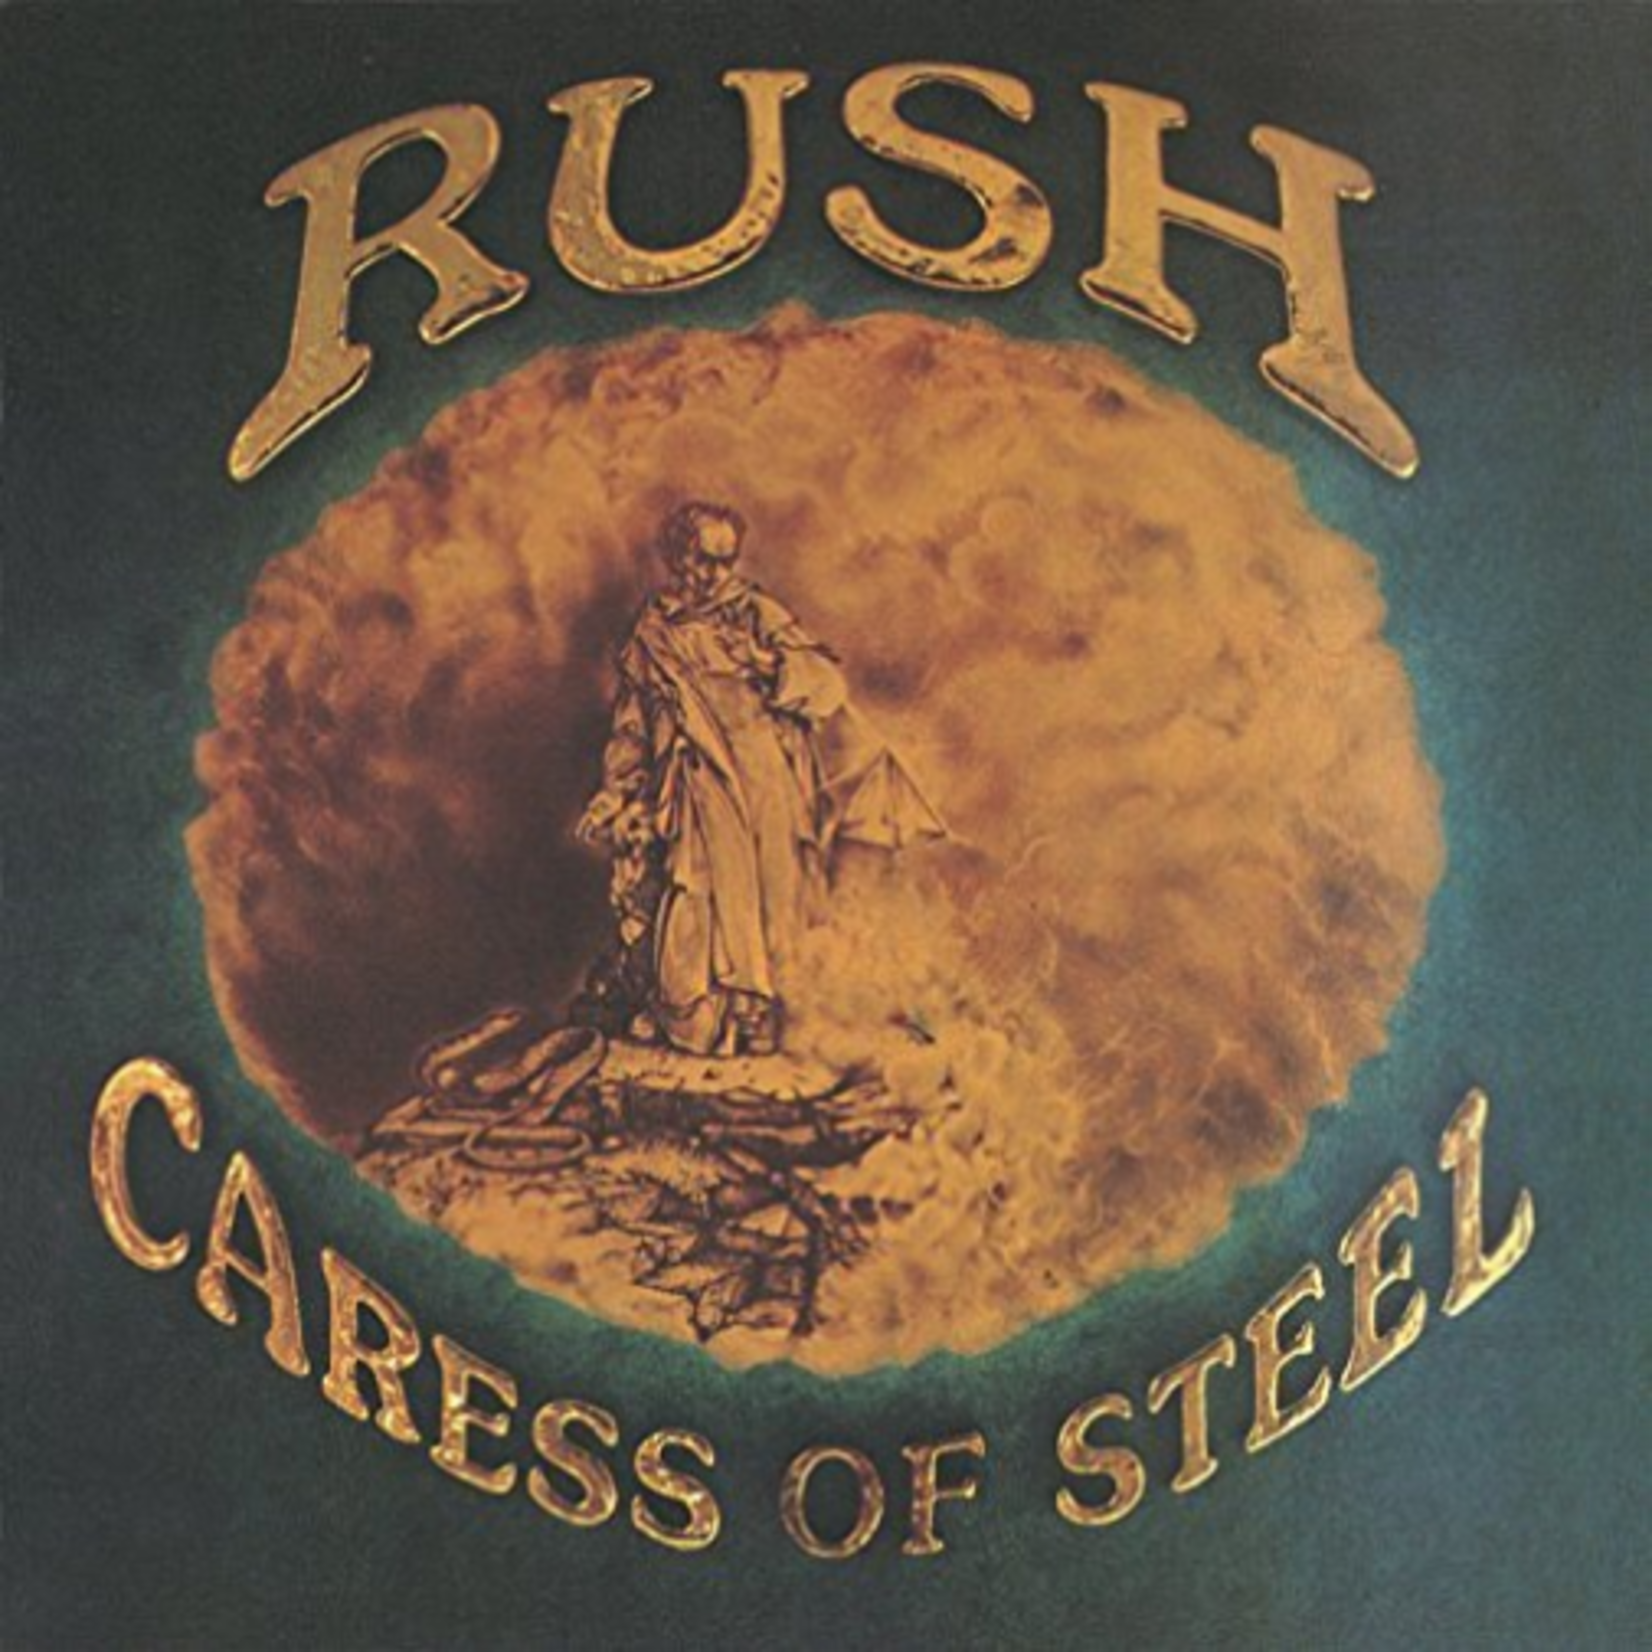 RUSH CARESS OF STEEL  200g LP